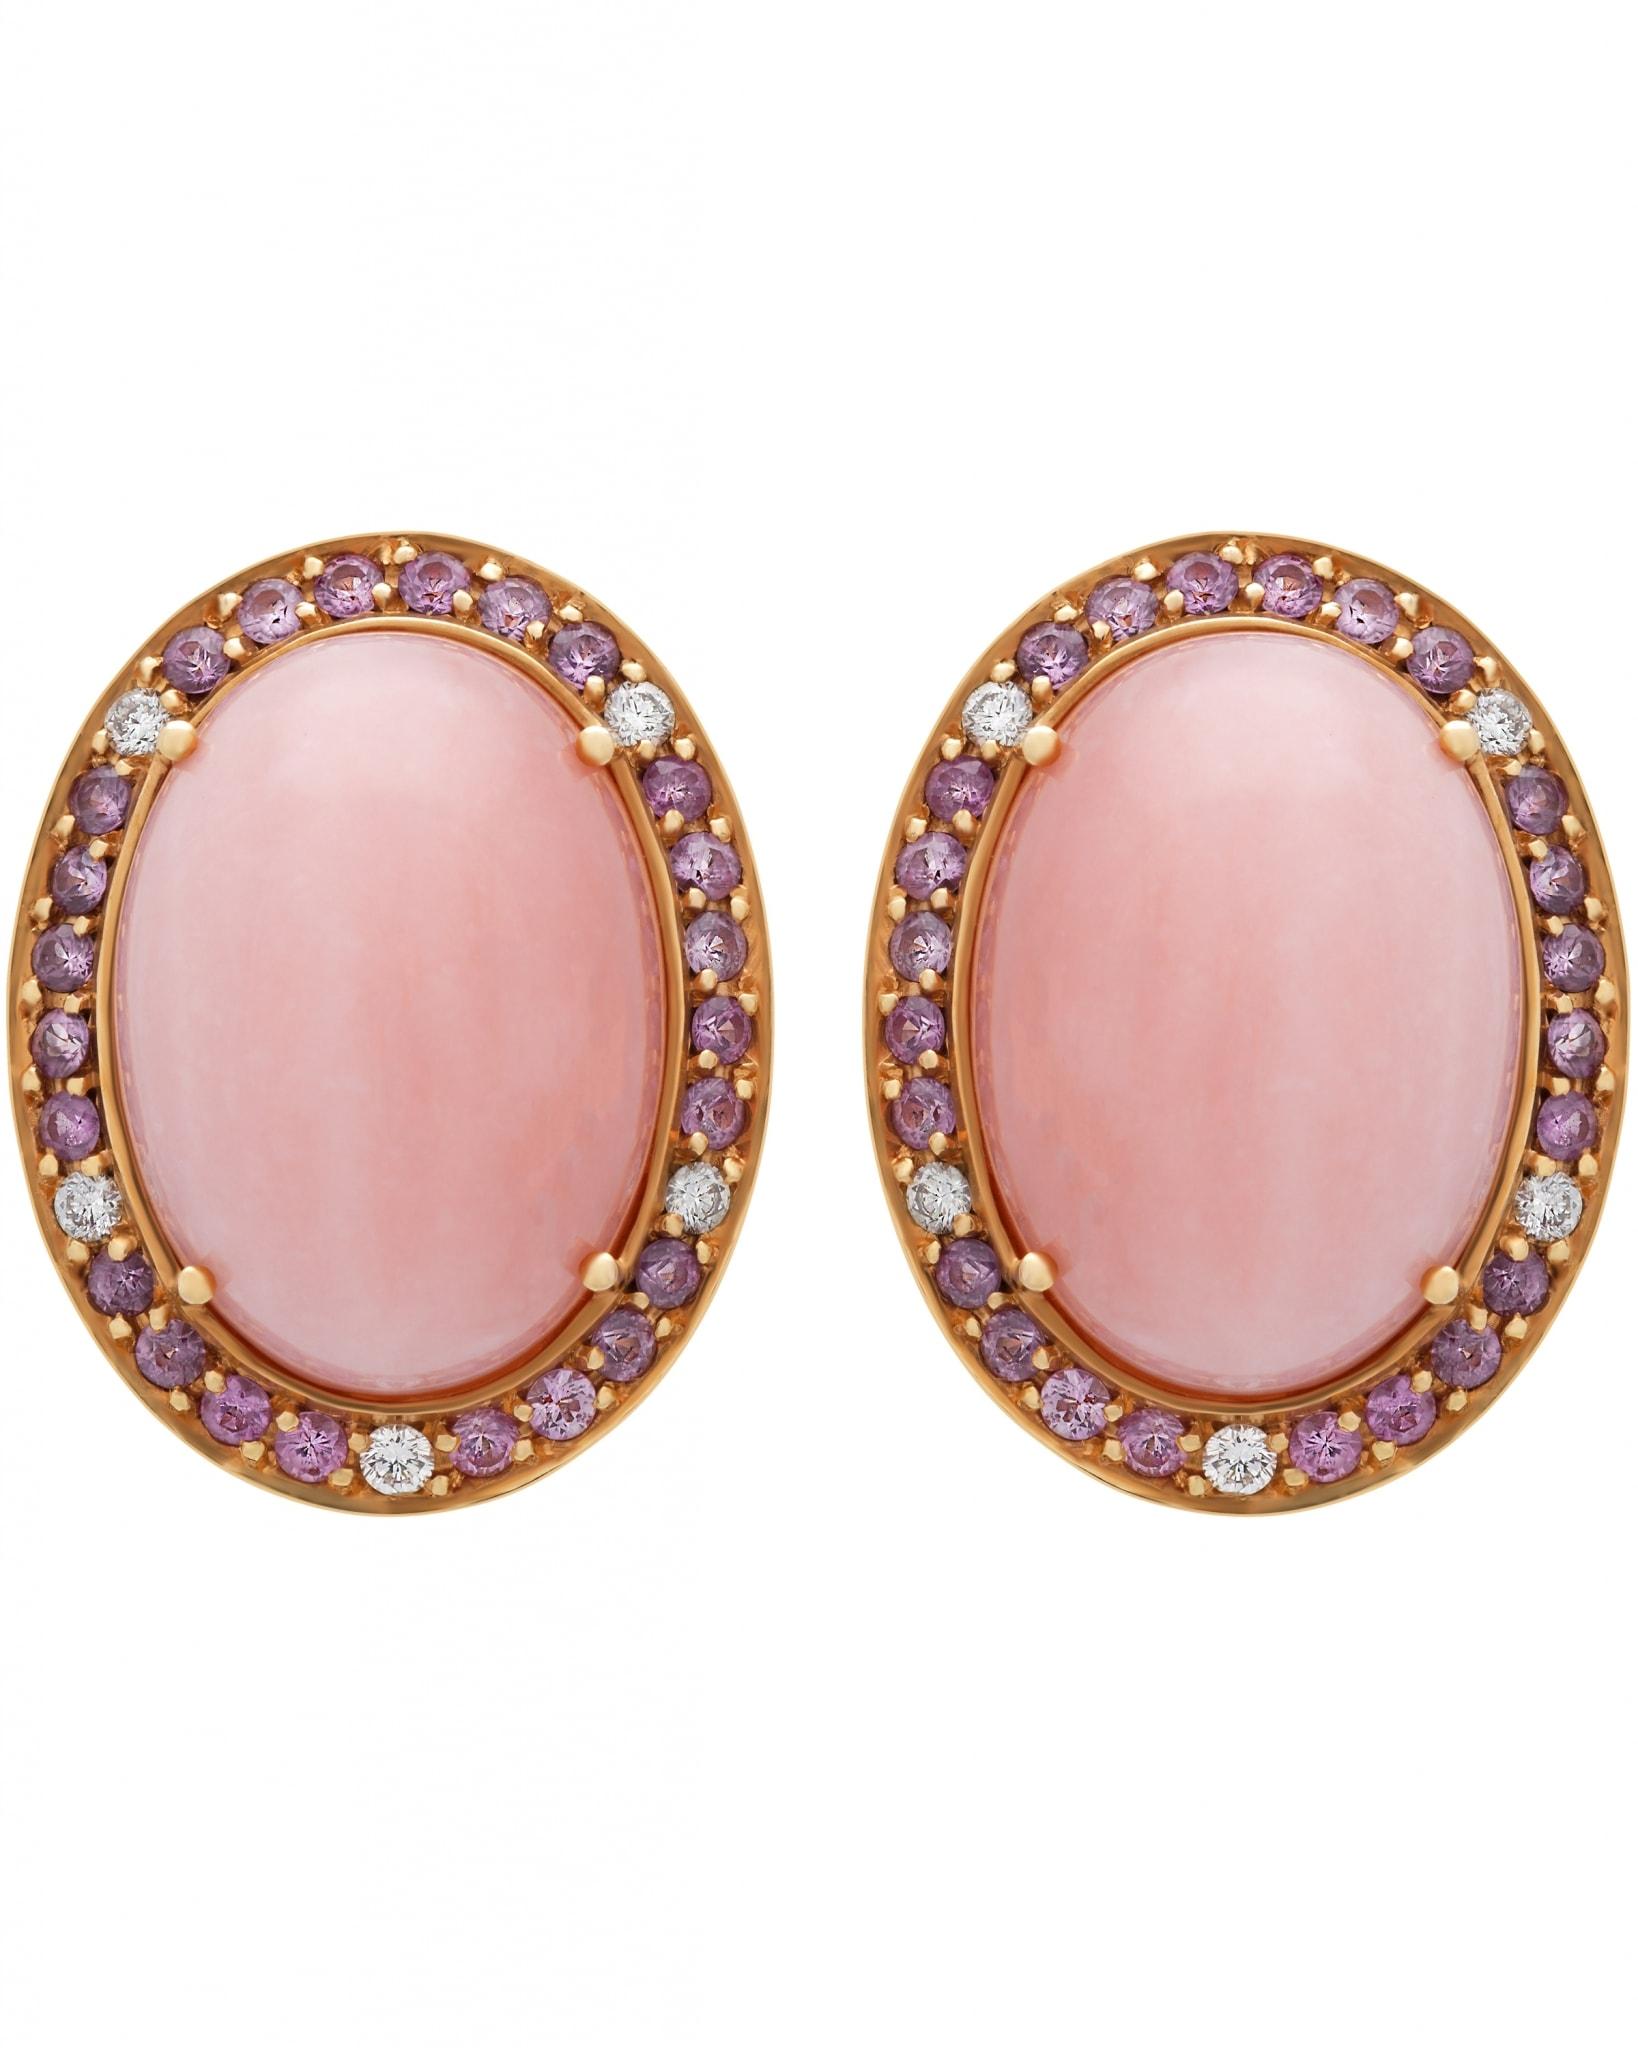 GIANNI LAZZARO – 18K Rose Gold, Diamonds, Pink Sapphires, & Pink Opal, Earrings